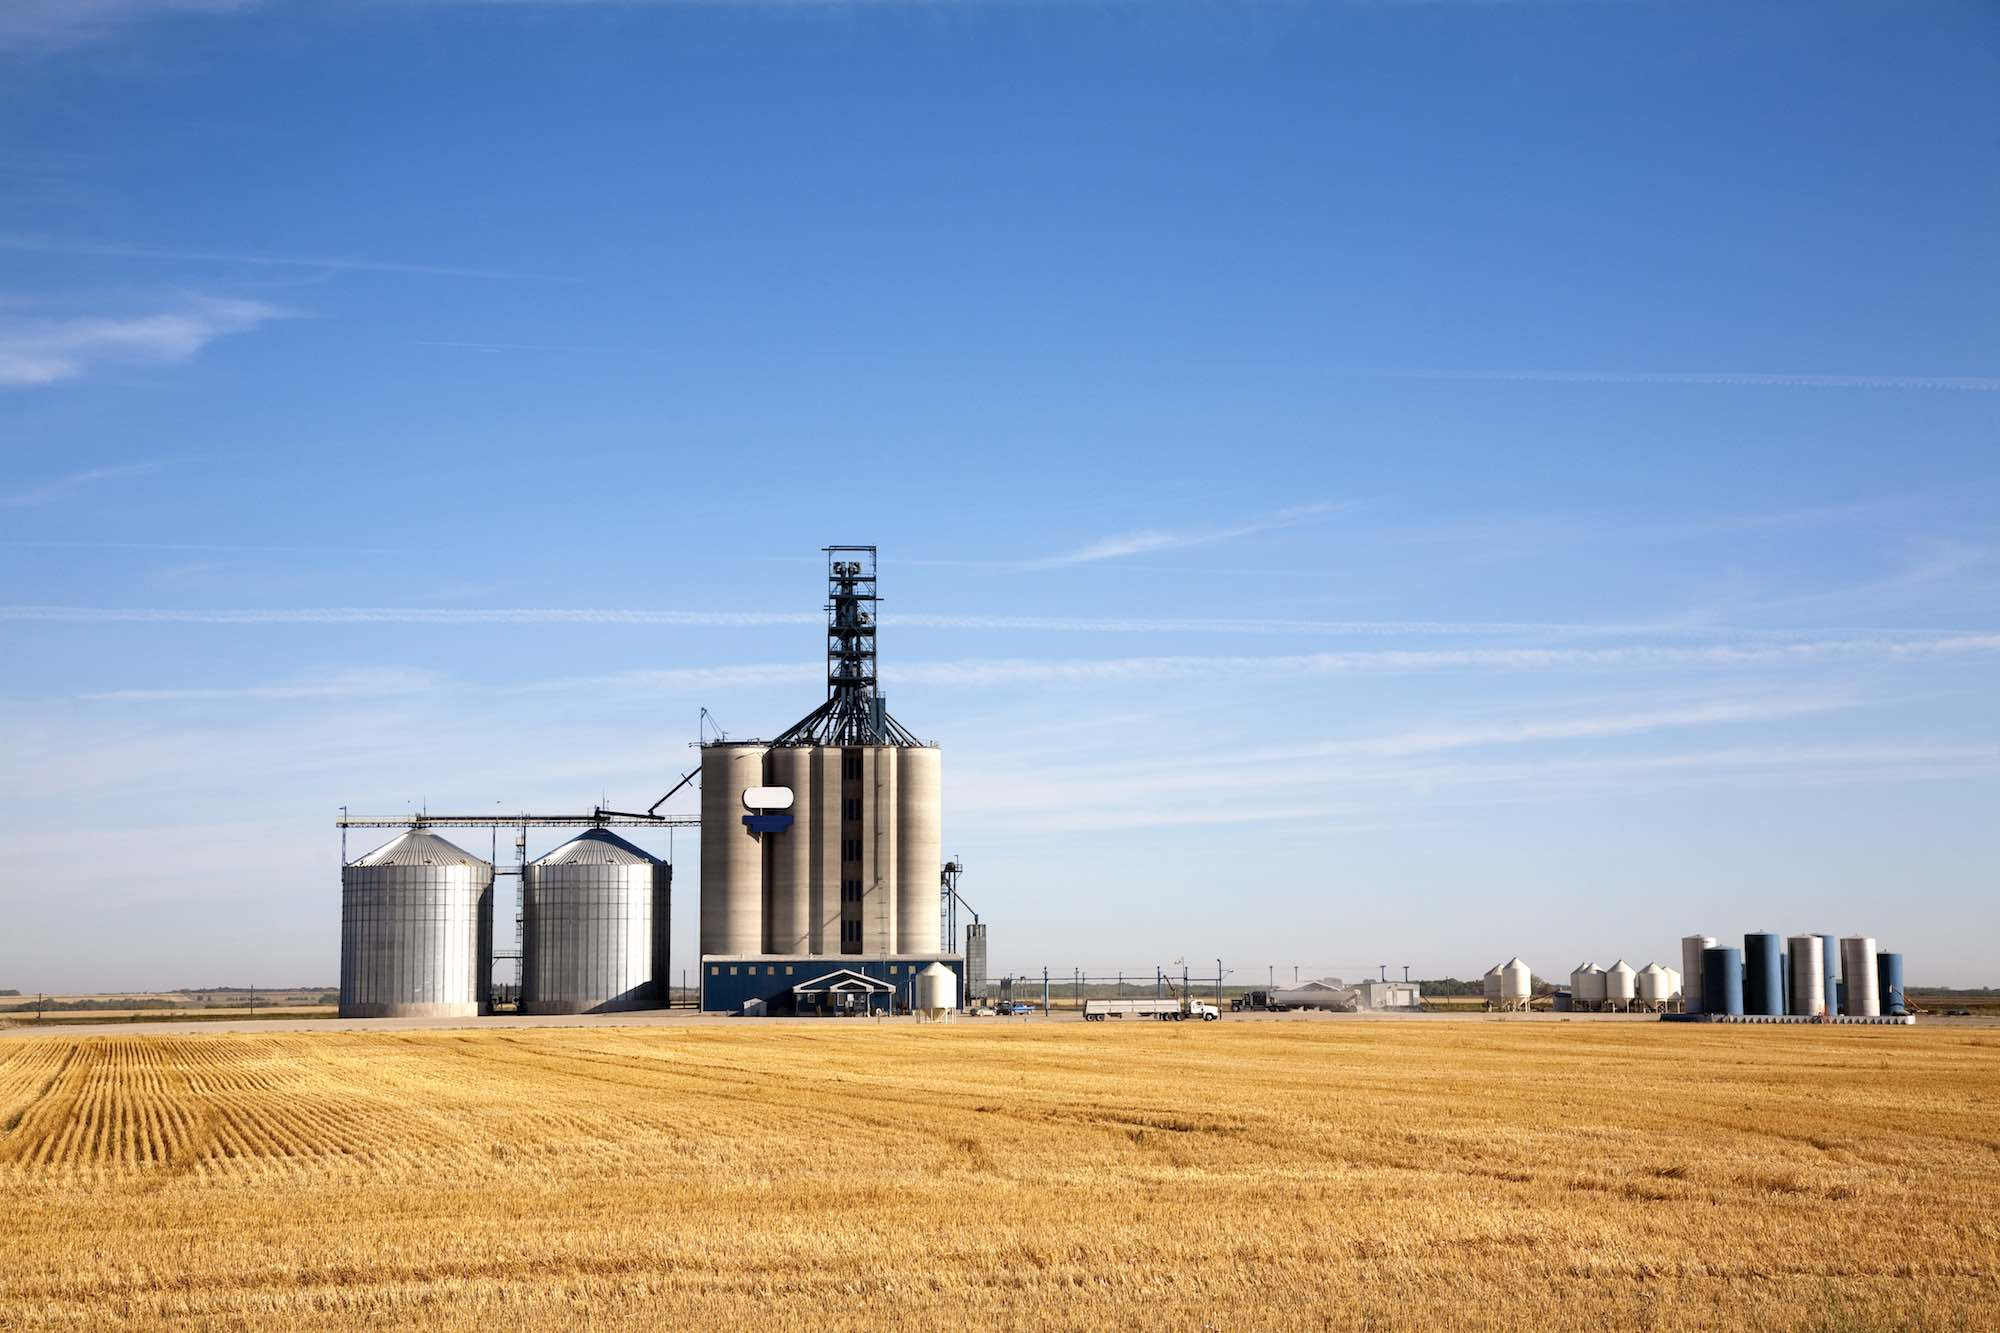 fotografia de silos junto a un campo de maiz